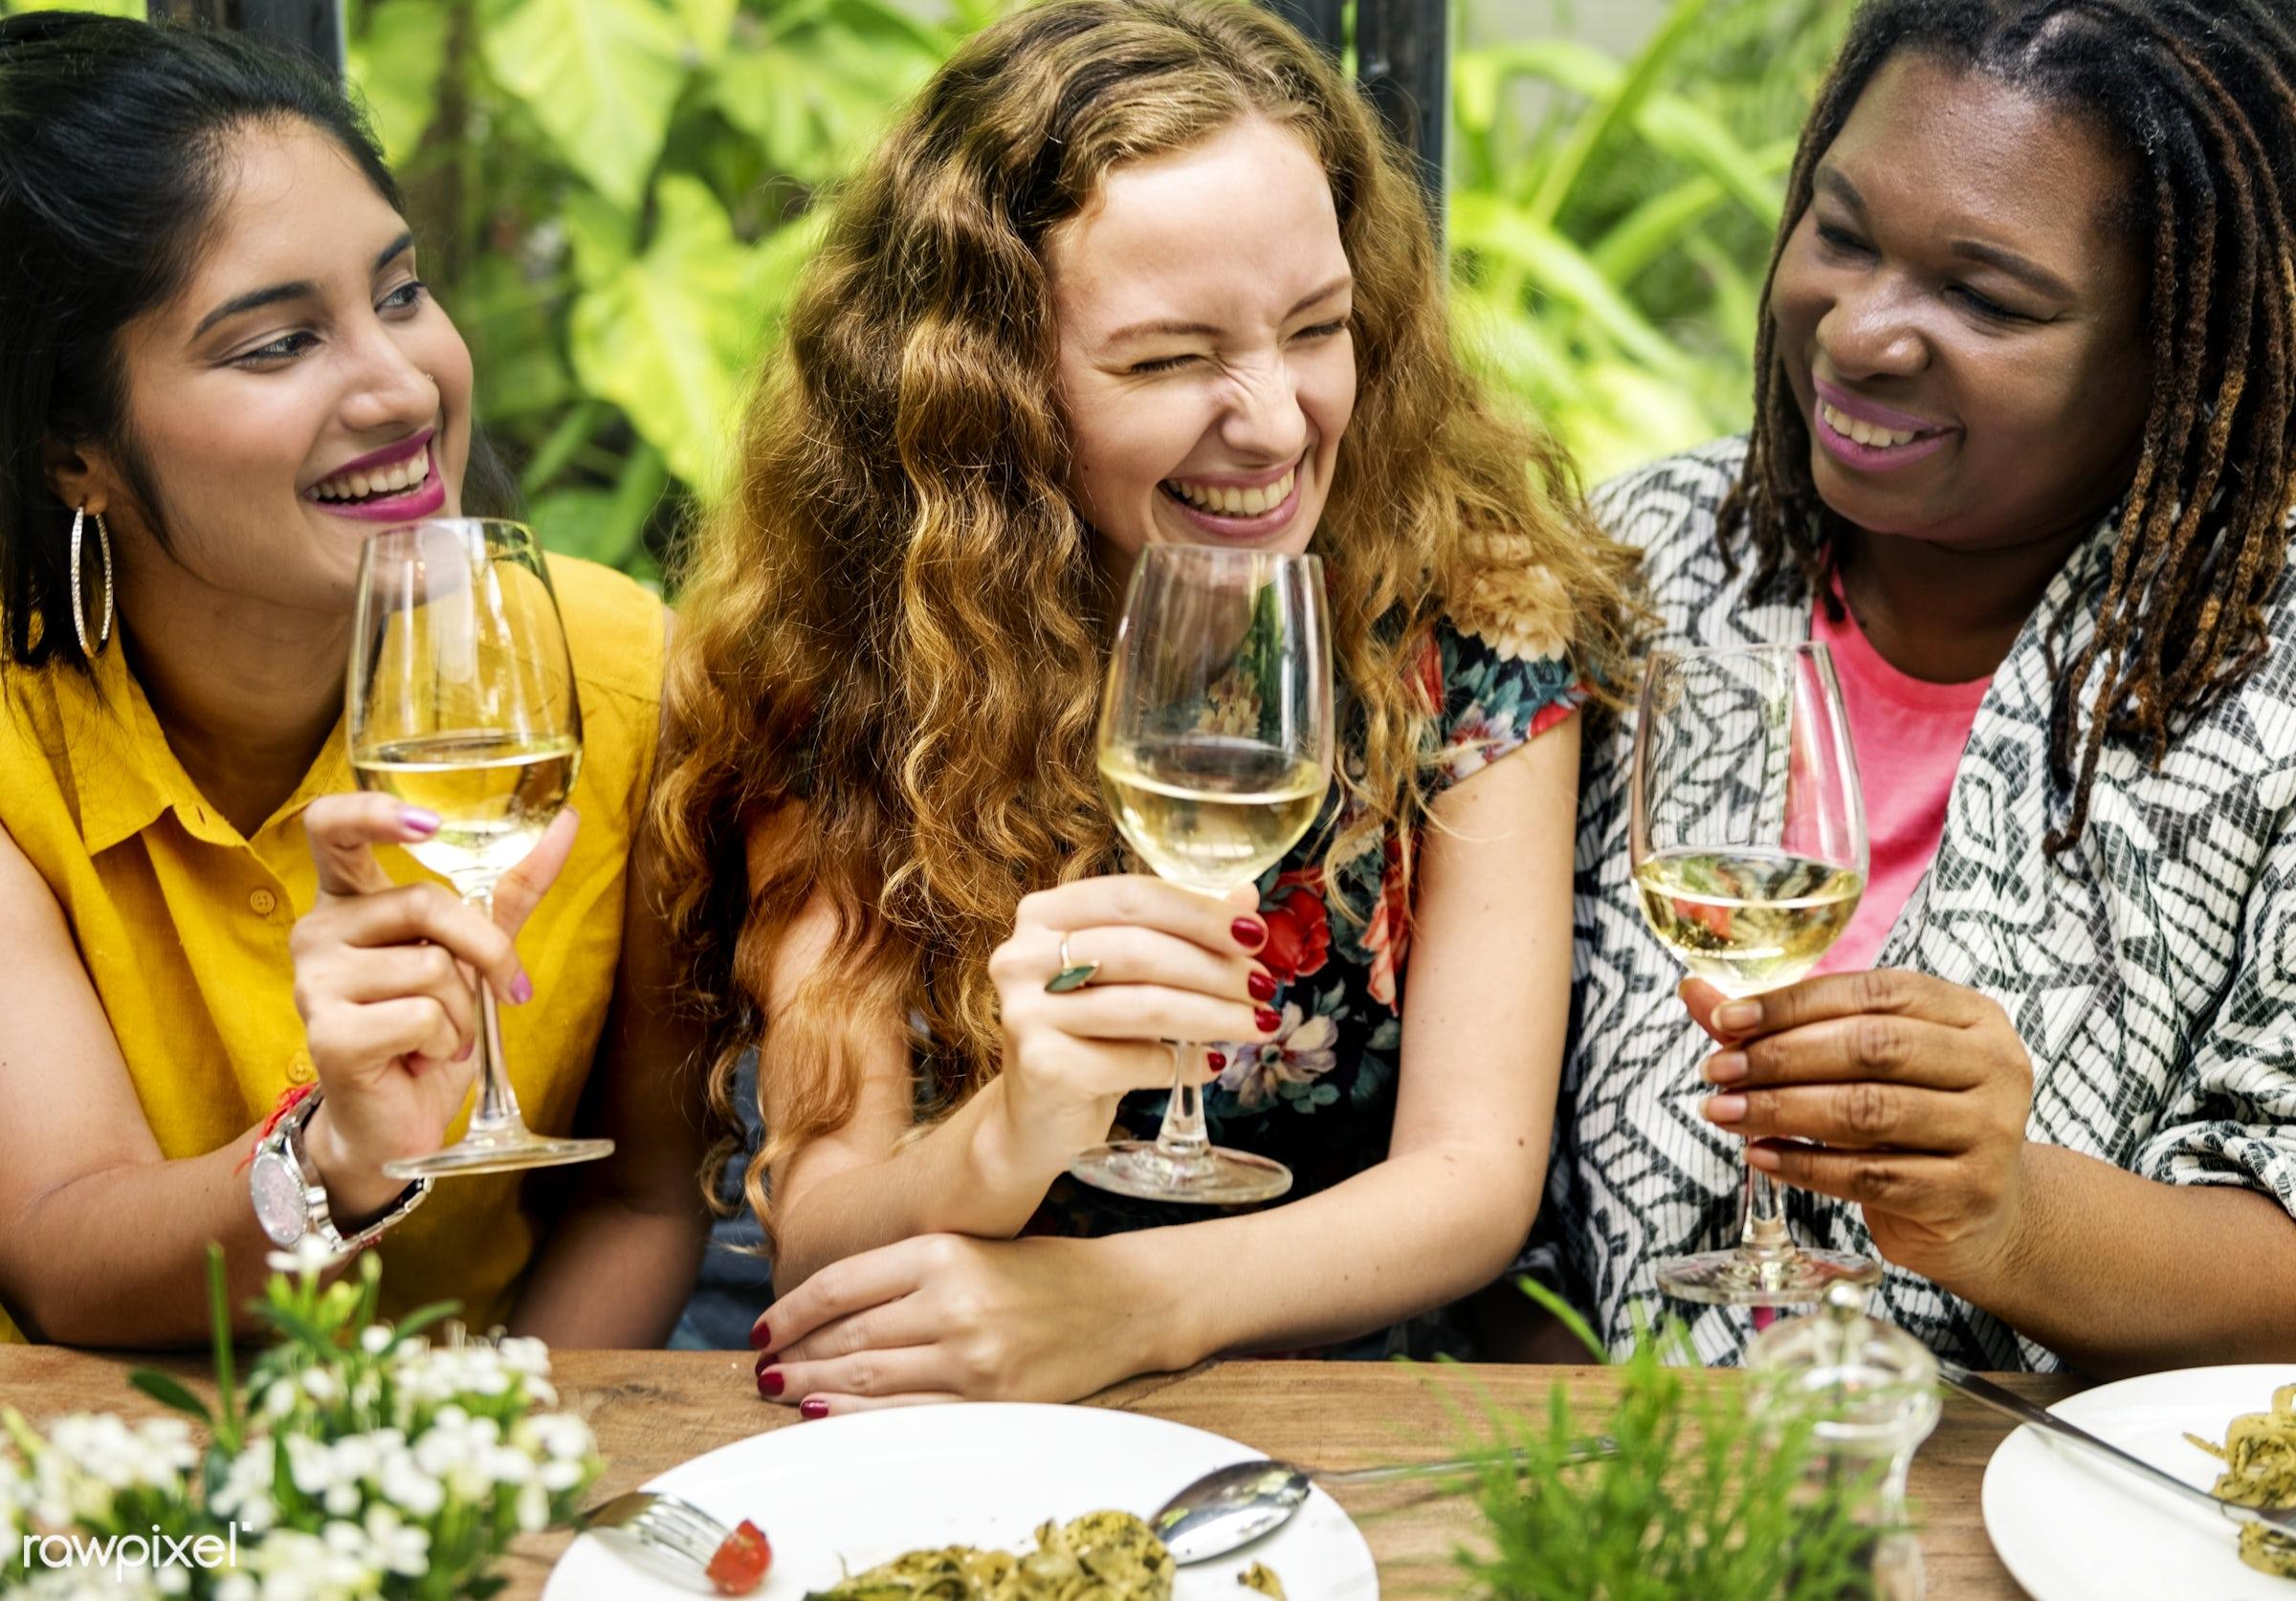 Women having wine together - wine, adult, african, african descent, black, bonding, bright, brunch, cafe, casual,...